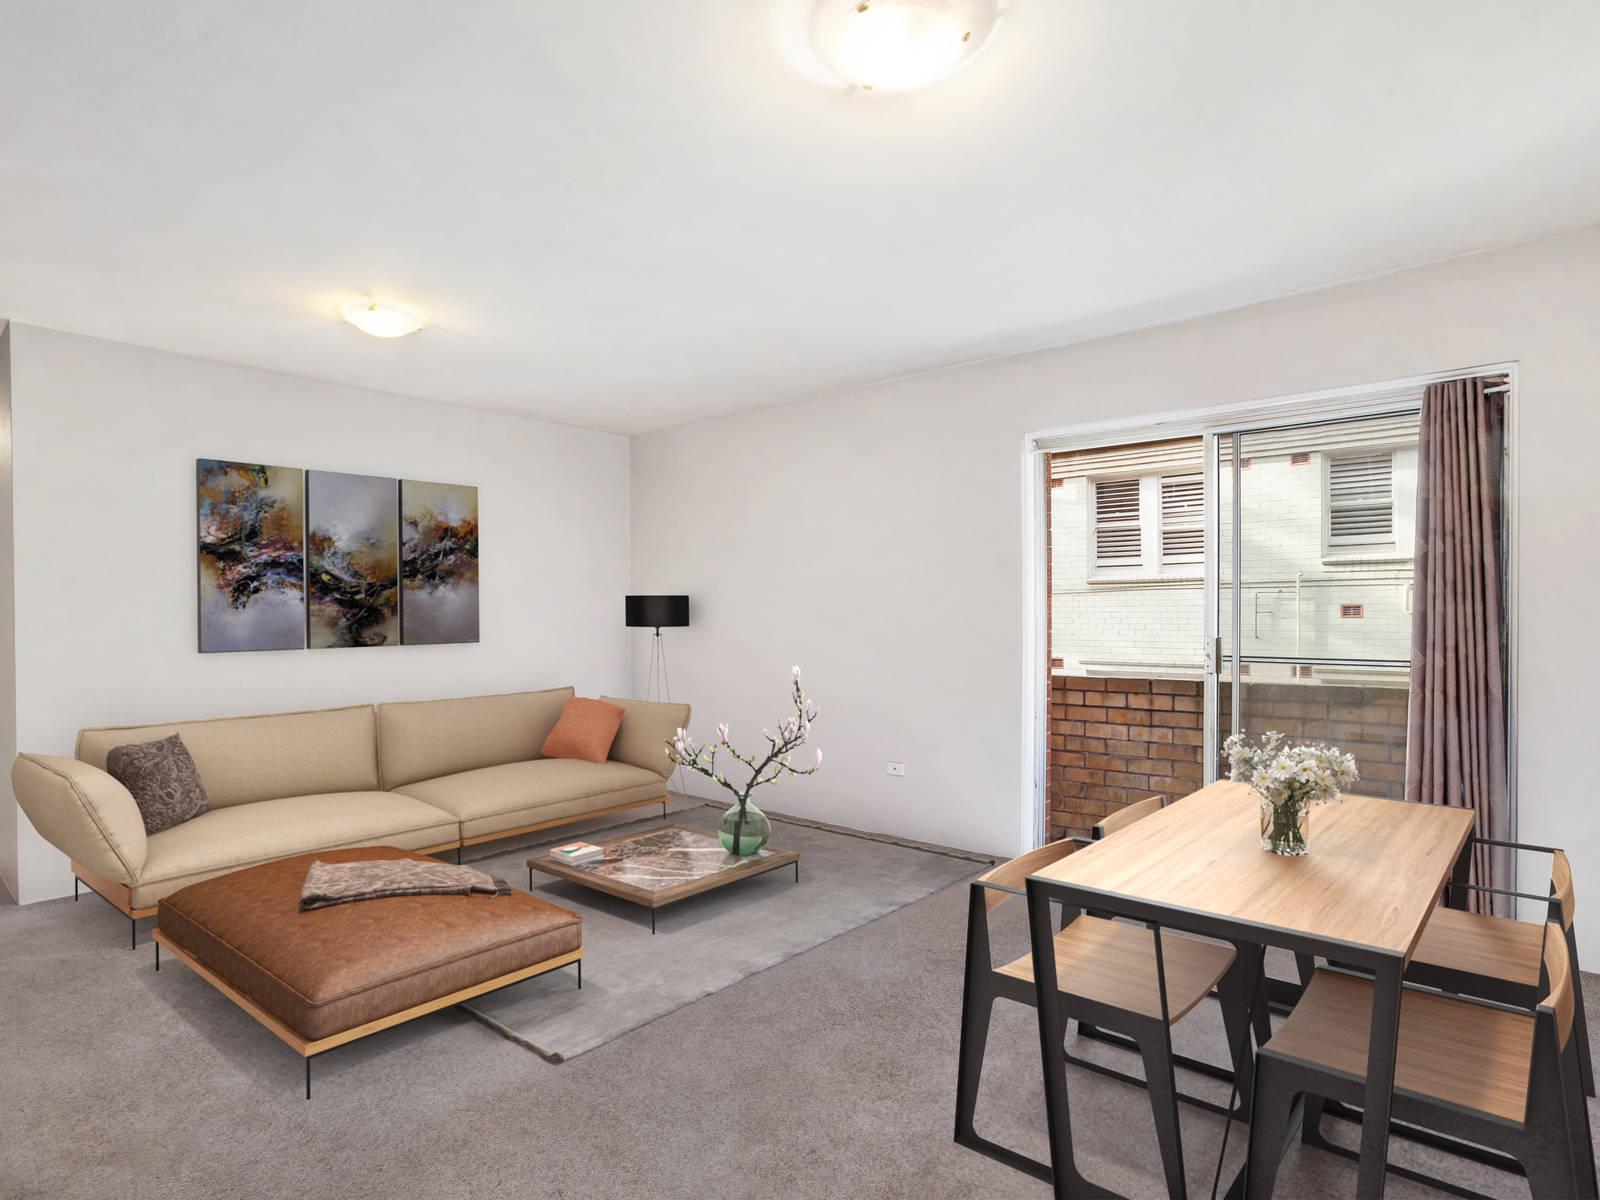 1/42 West Street, North Sydney NSW 2060   Unit Leased   Marriottlane.com.au